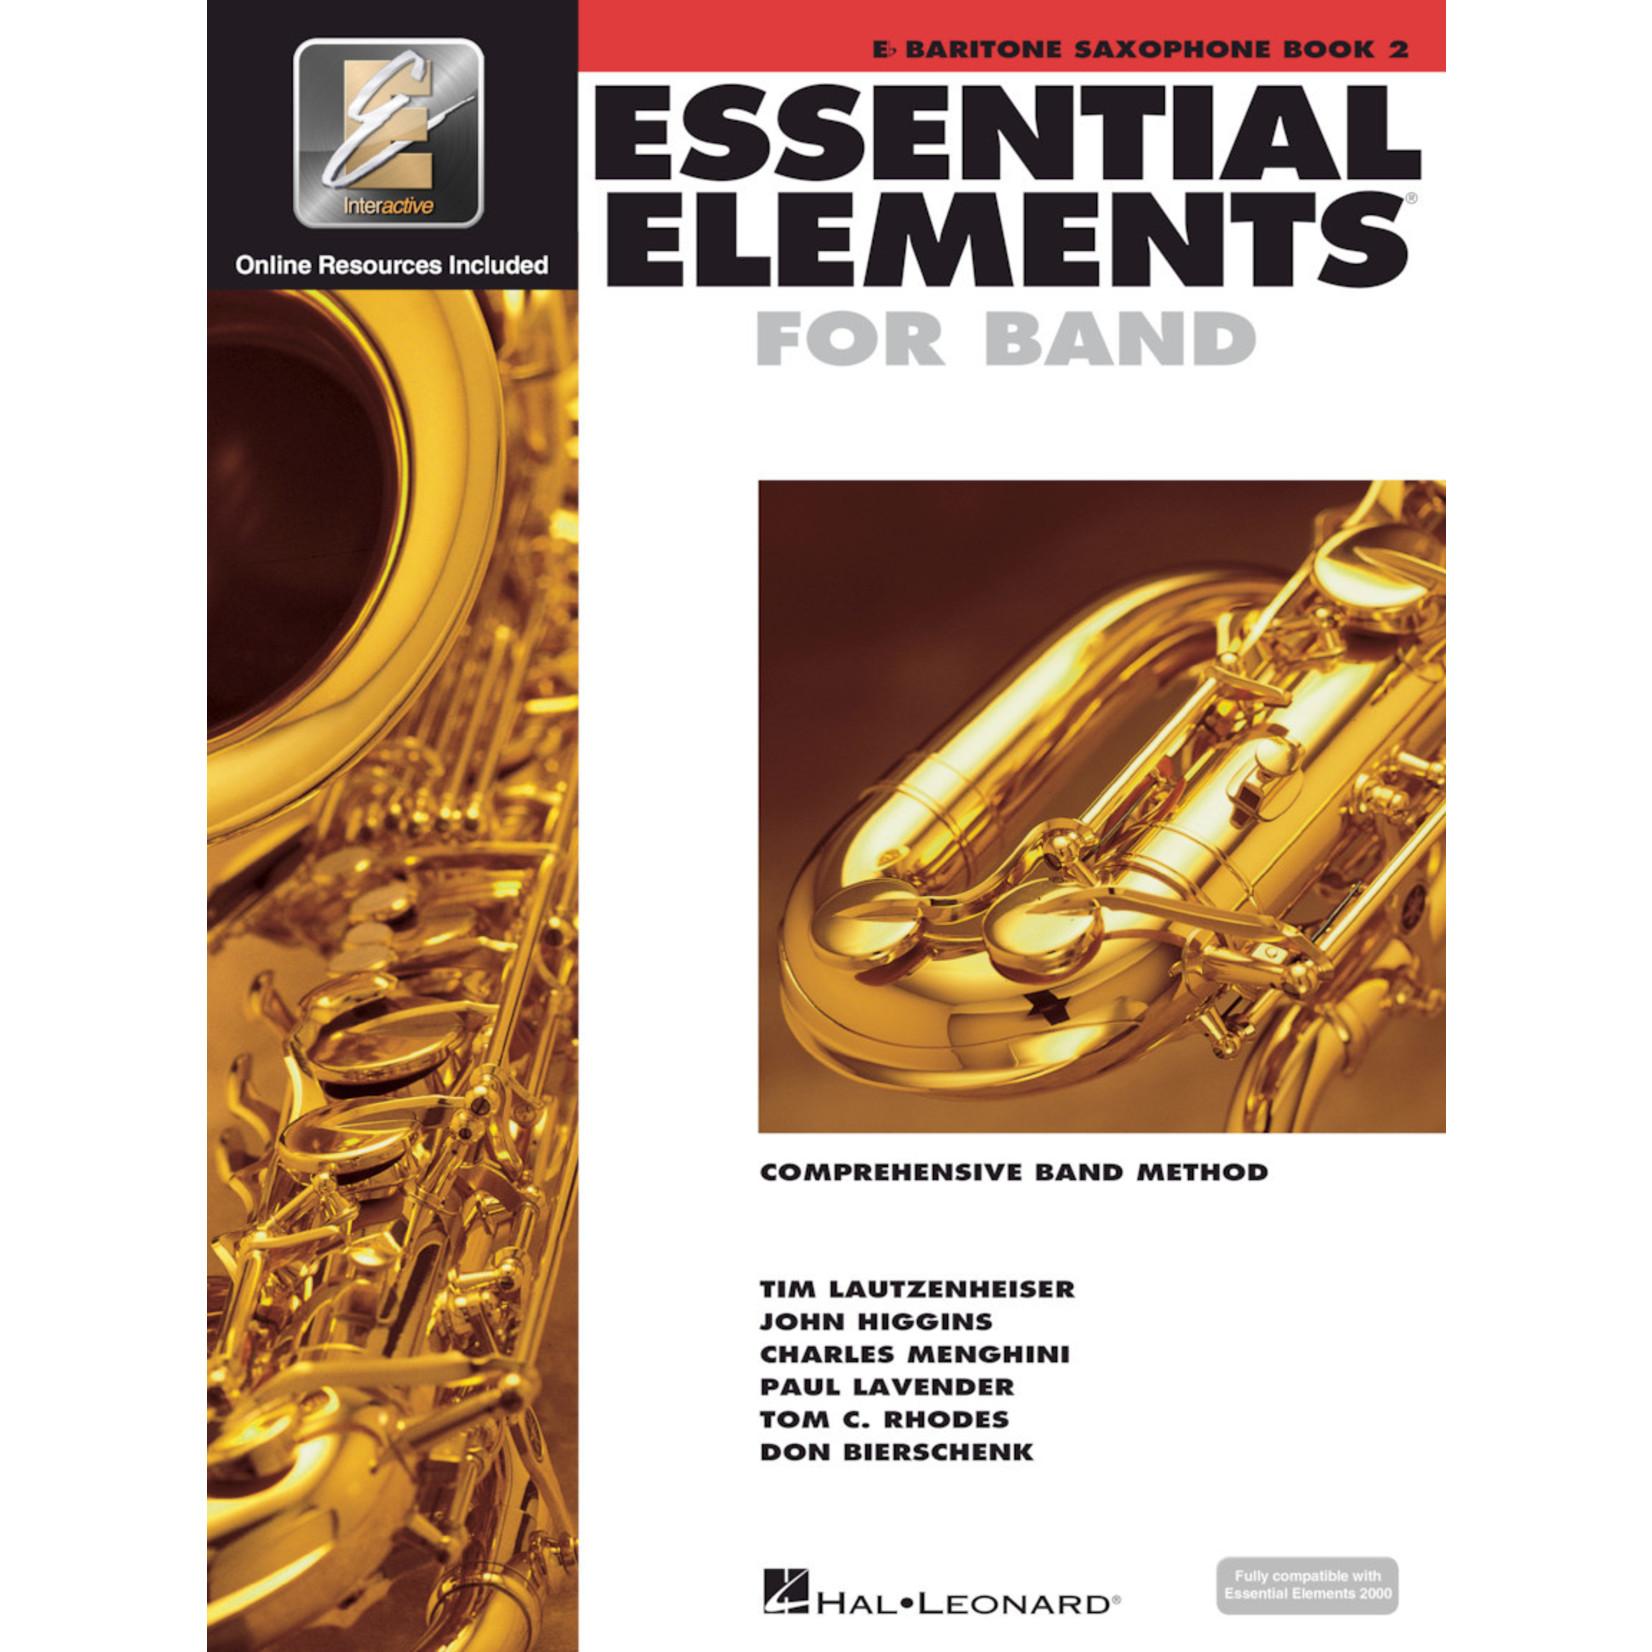 Hal Leonard Essential Elements for Band Baritone Saxophone Book 2